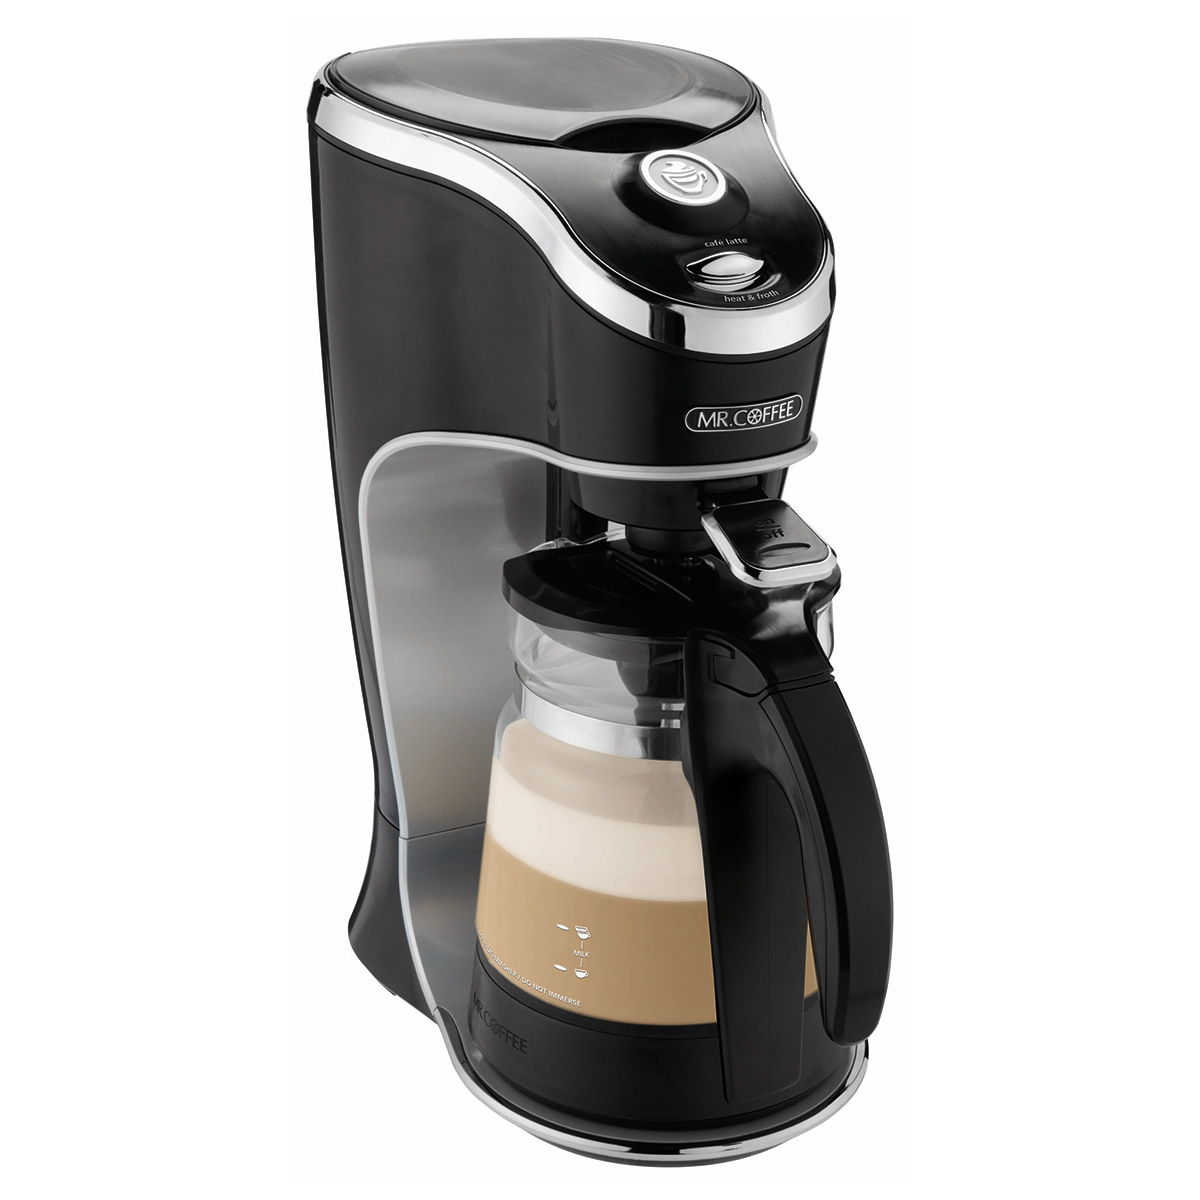 Mr Coffee Cafe Latte Home Brewer Black BVMC EL1 Walmart